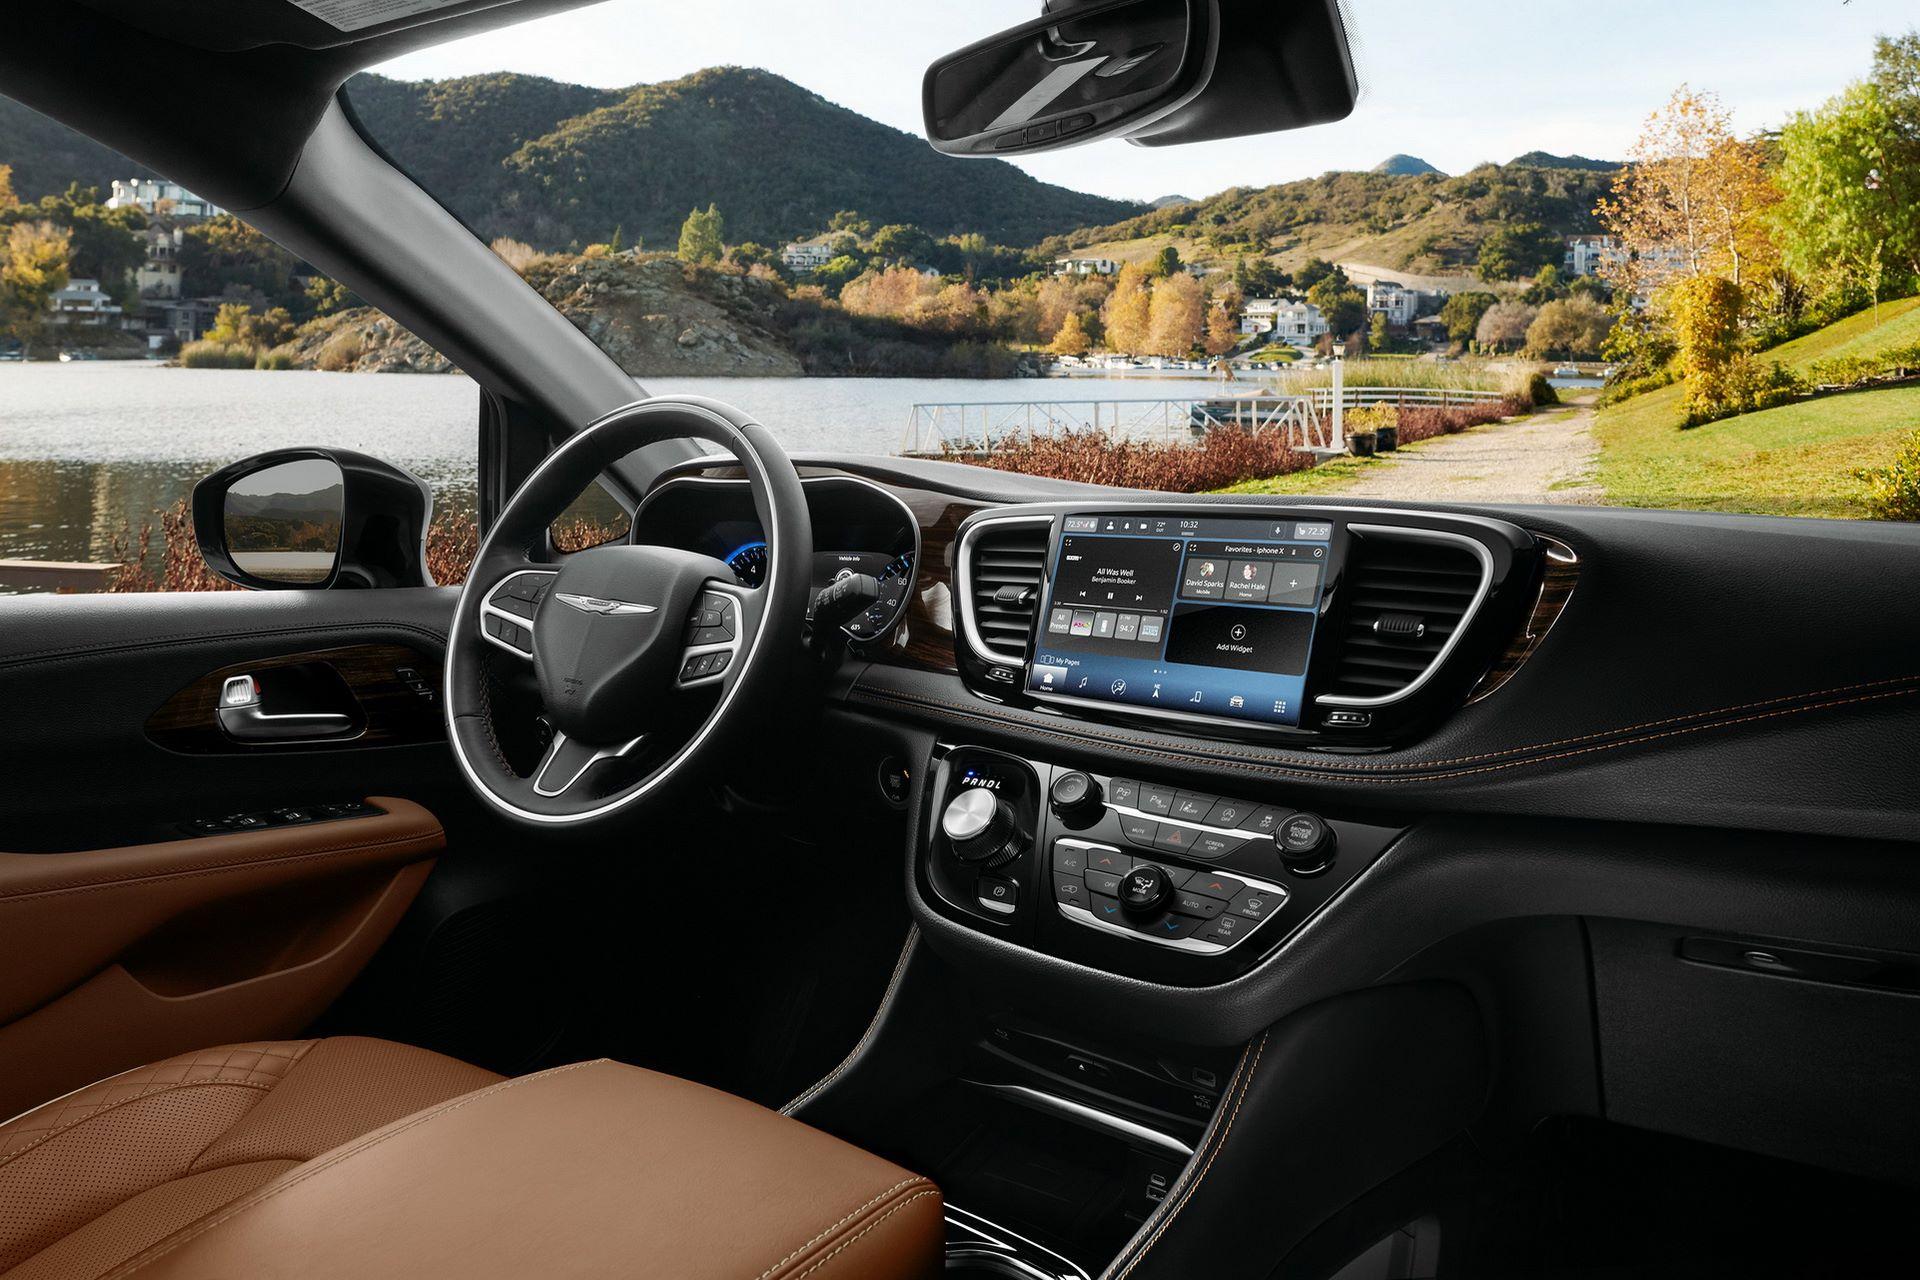 2021-Chrysler-Pacifica-40